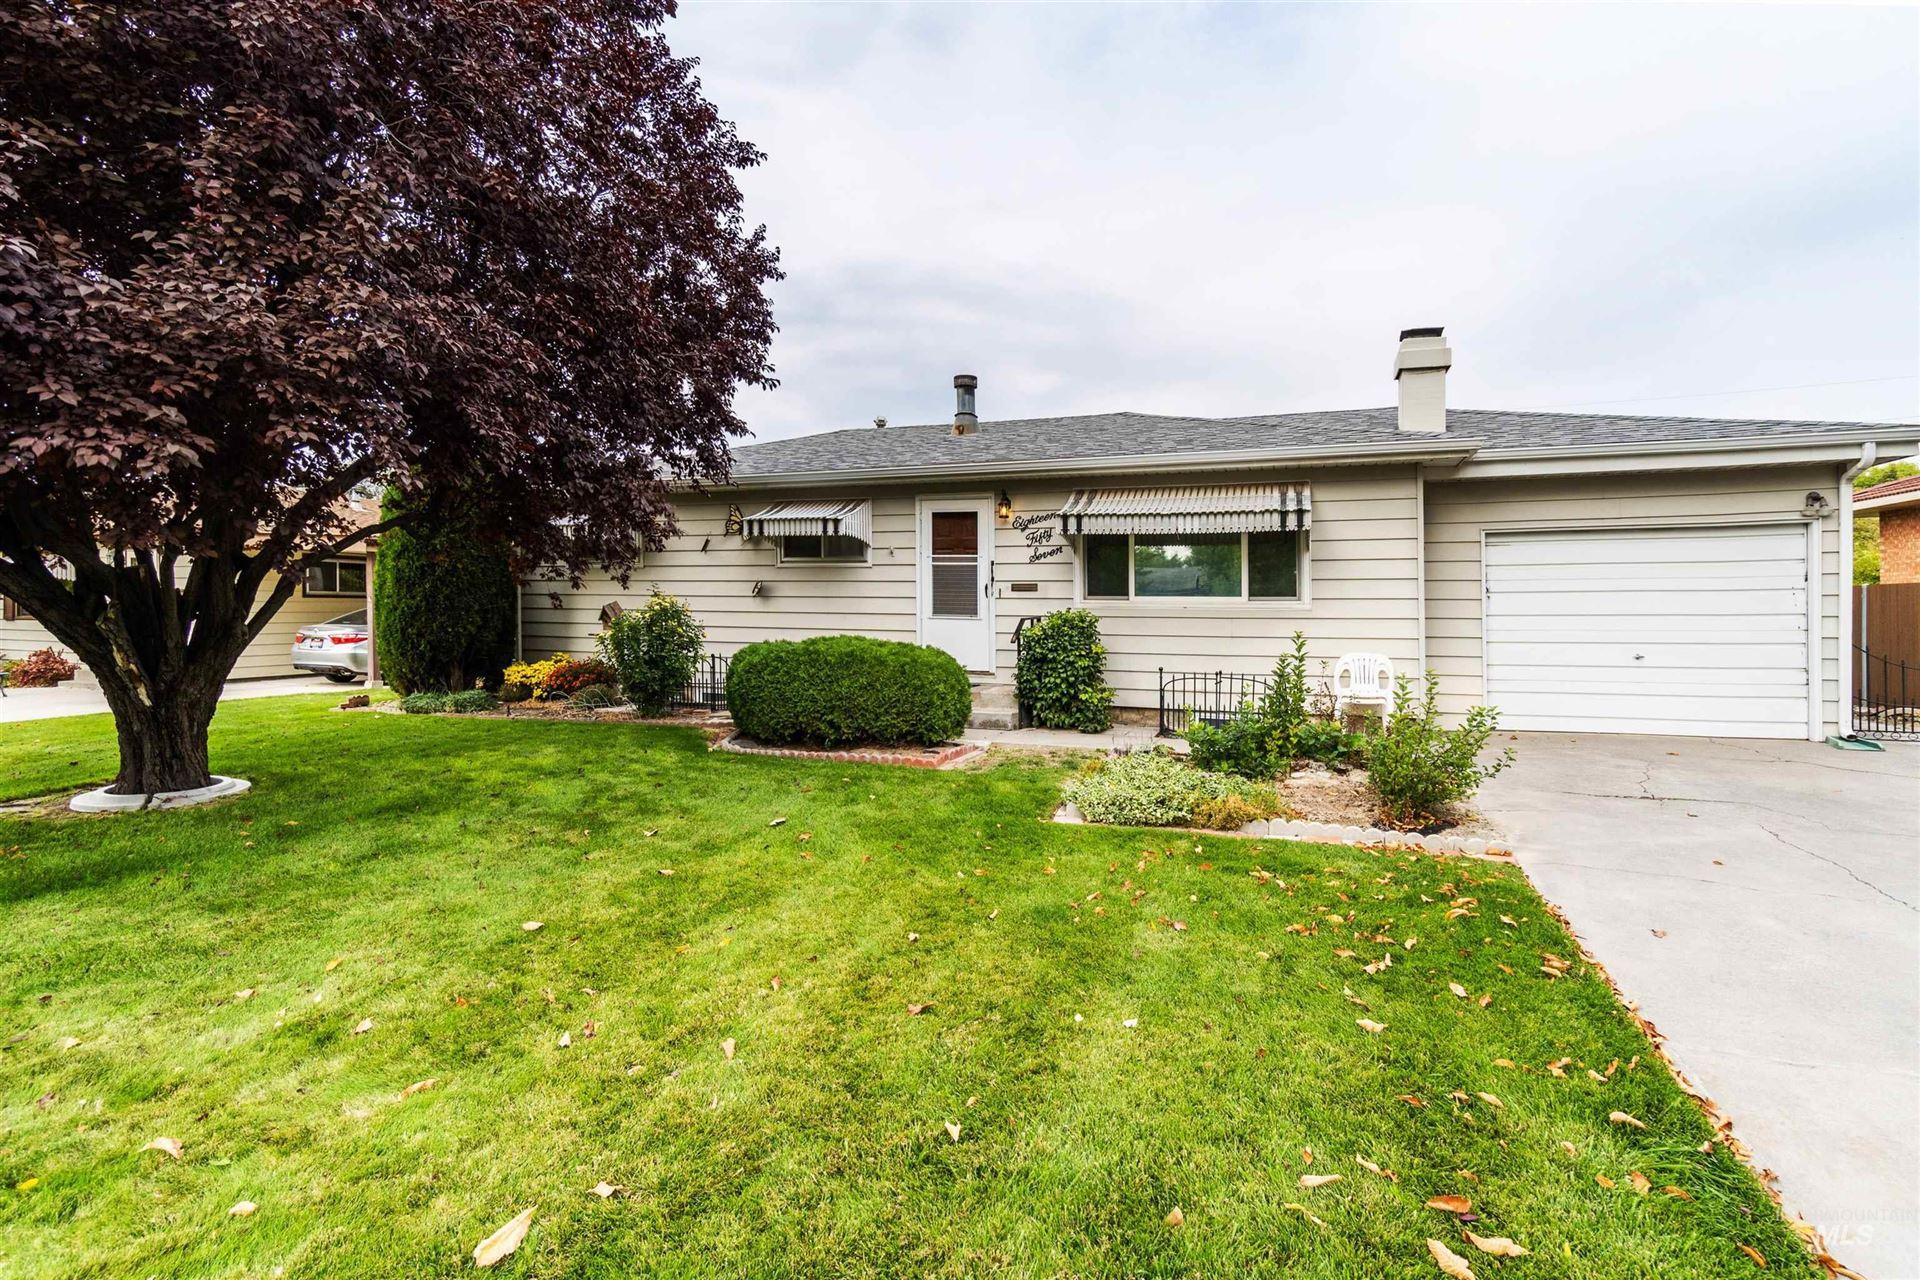 1857 E 9th Ave, Twin Falls, ID 83301 - MLS#: 98821394